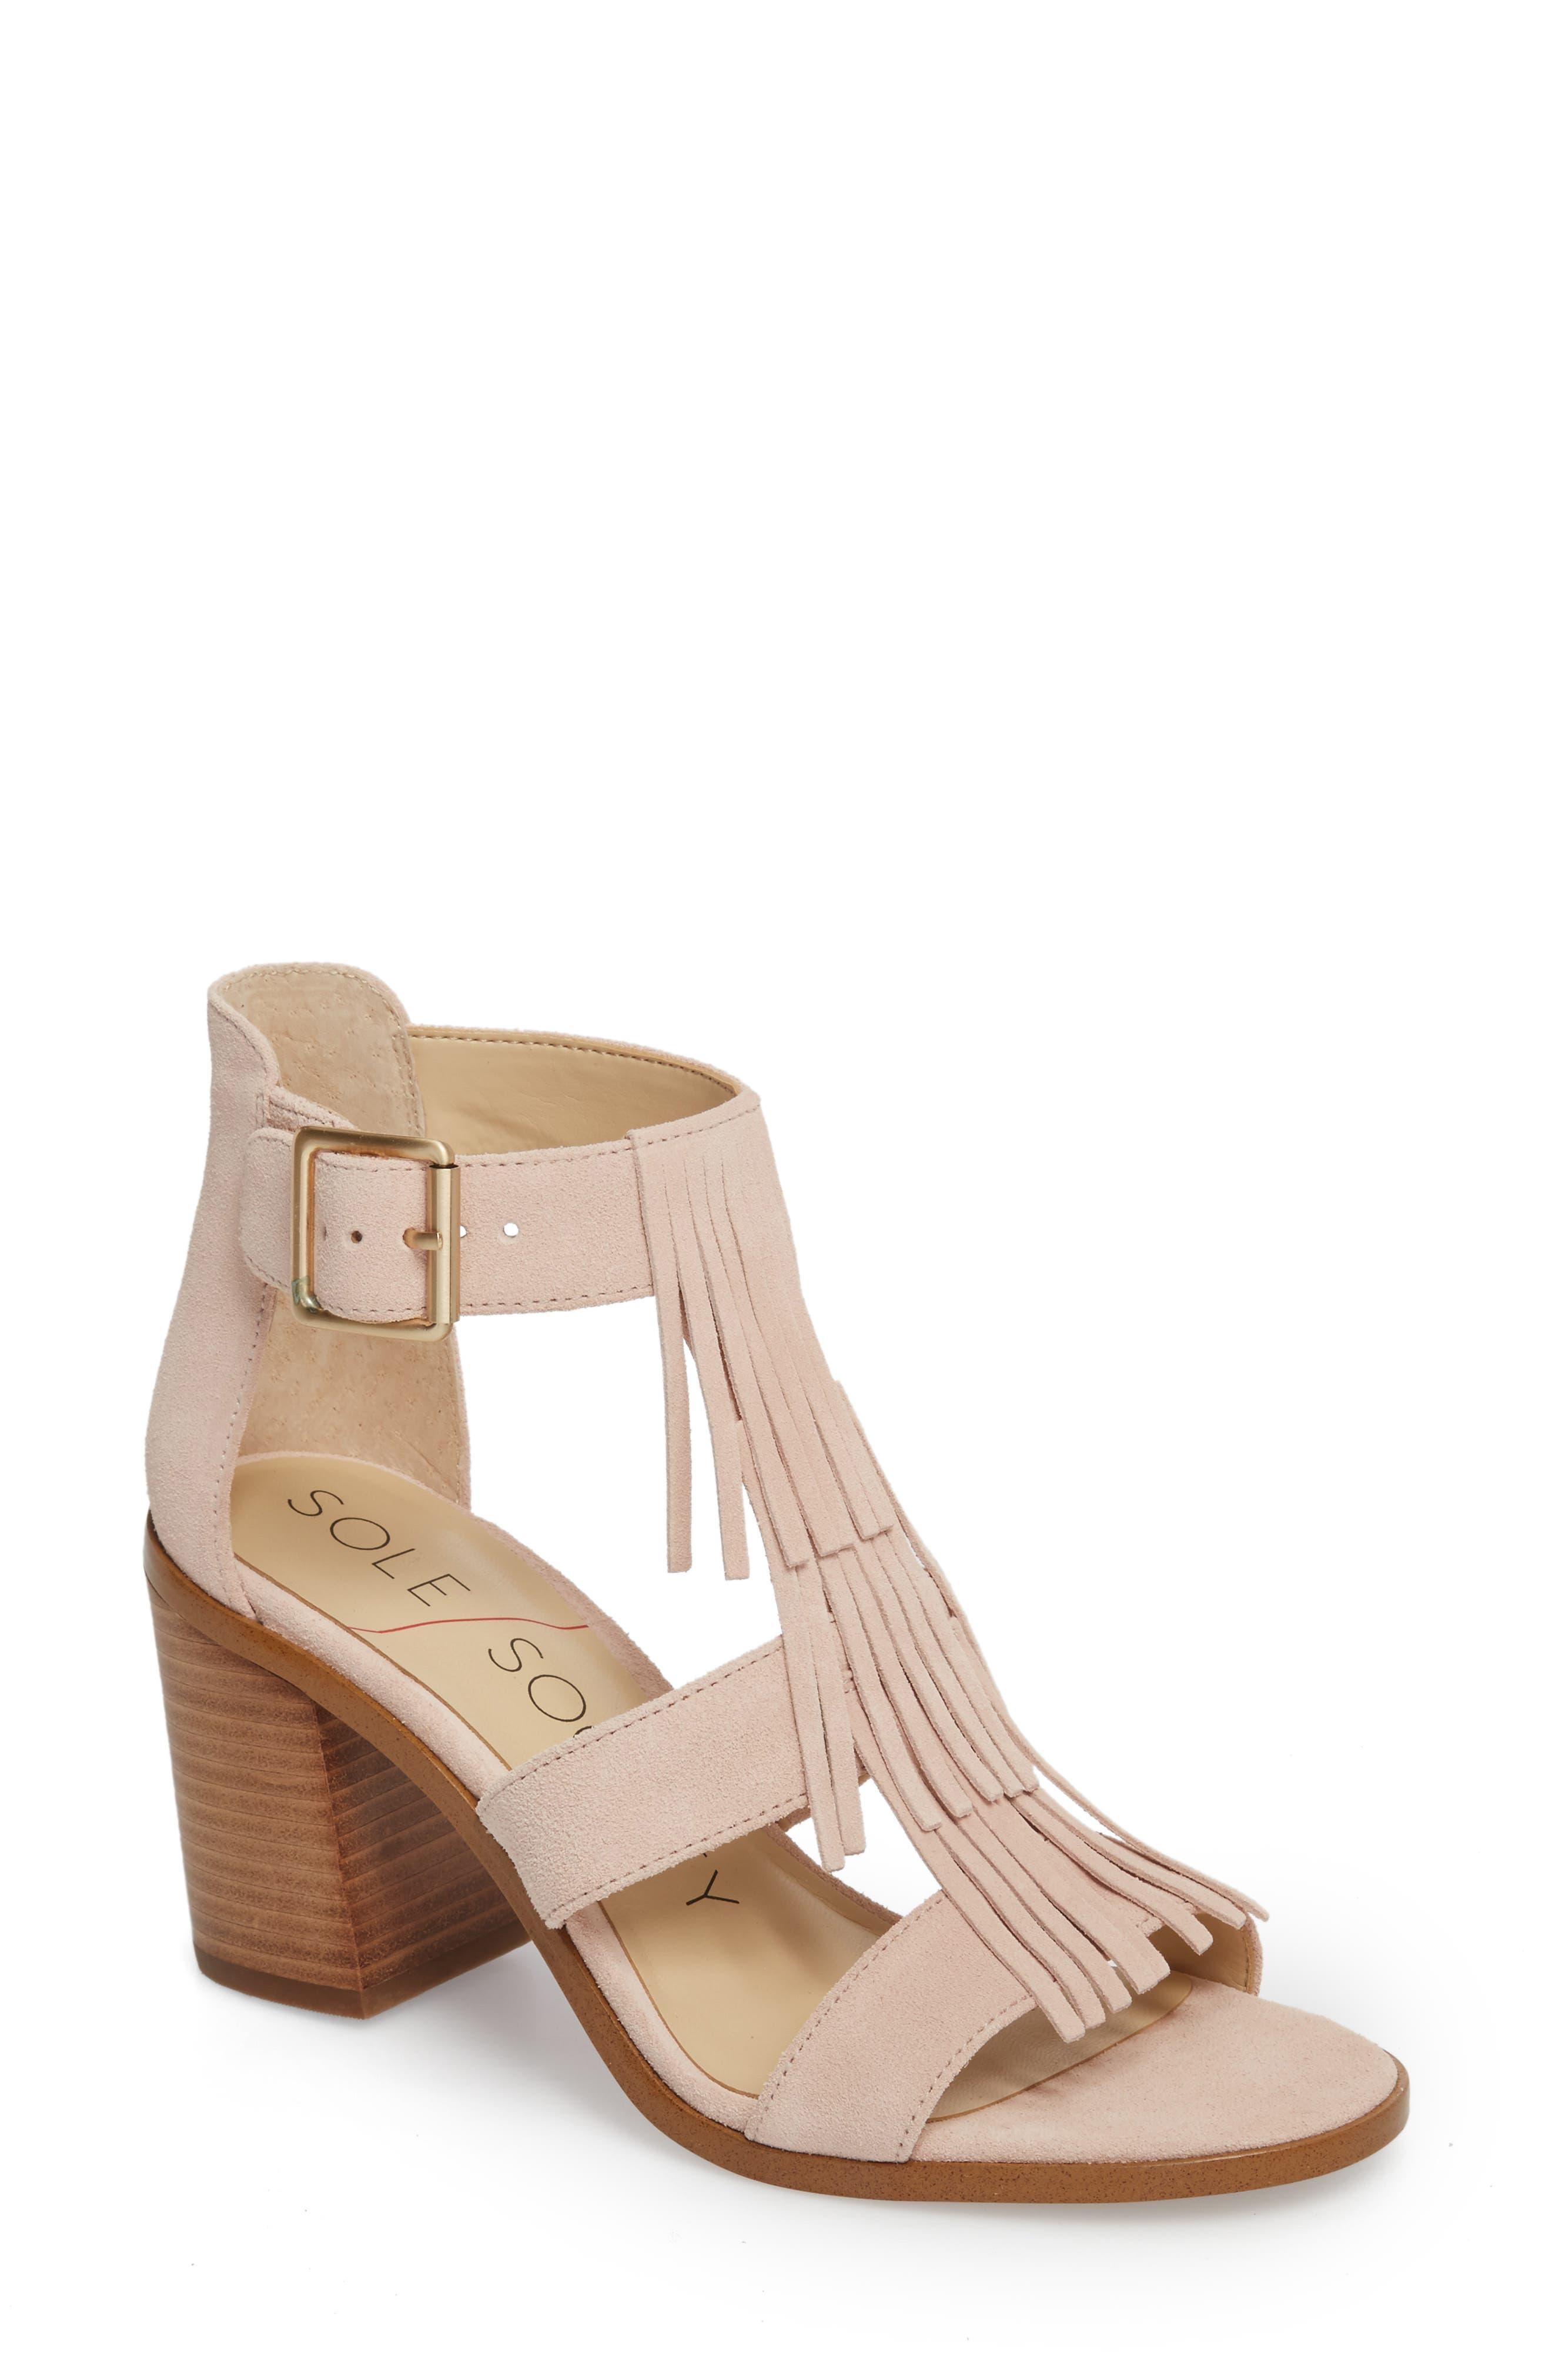 SOLE SOCIETY 'Delilah' Fringe Sandal, Main, color, SPRING BLUSH COW SUEDE